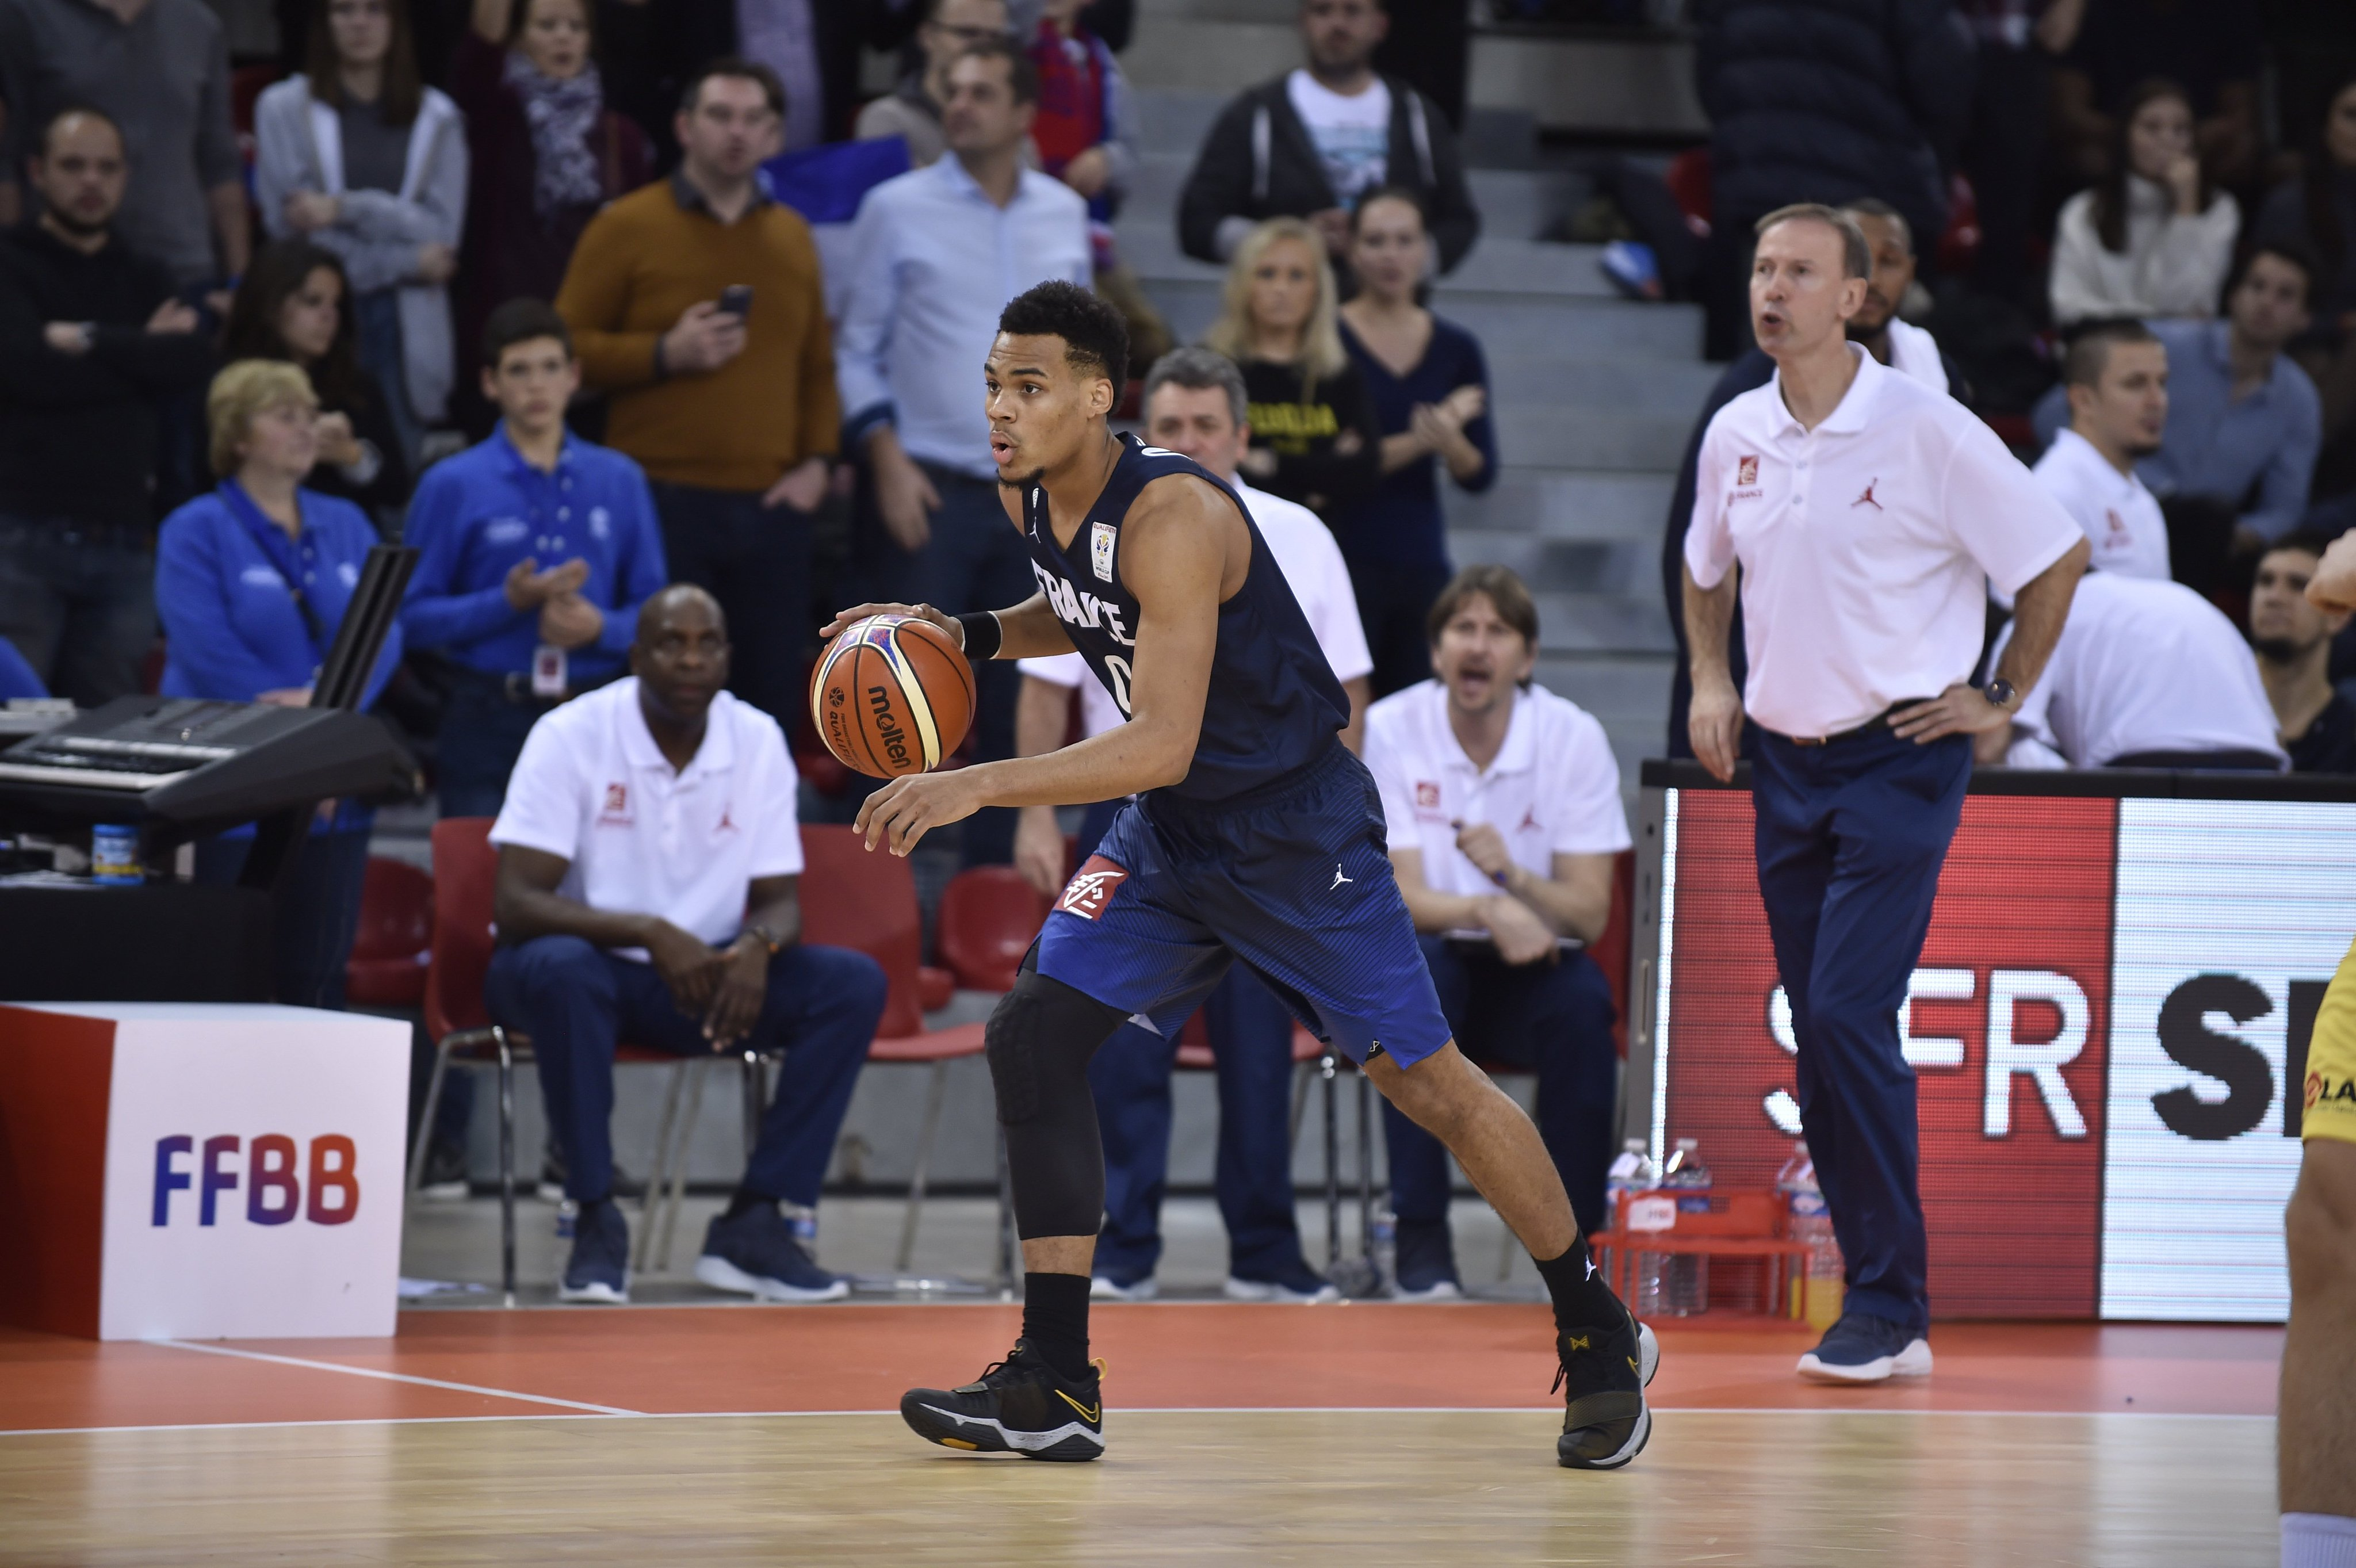 Basket - Equipe de France - Coupe du monde 2019 : Heurtel forfait, Okobo appelé en renfort